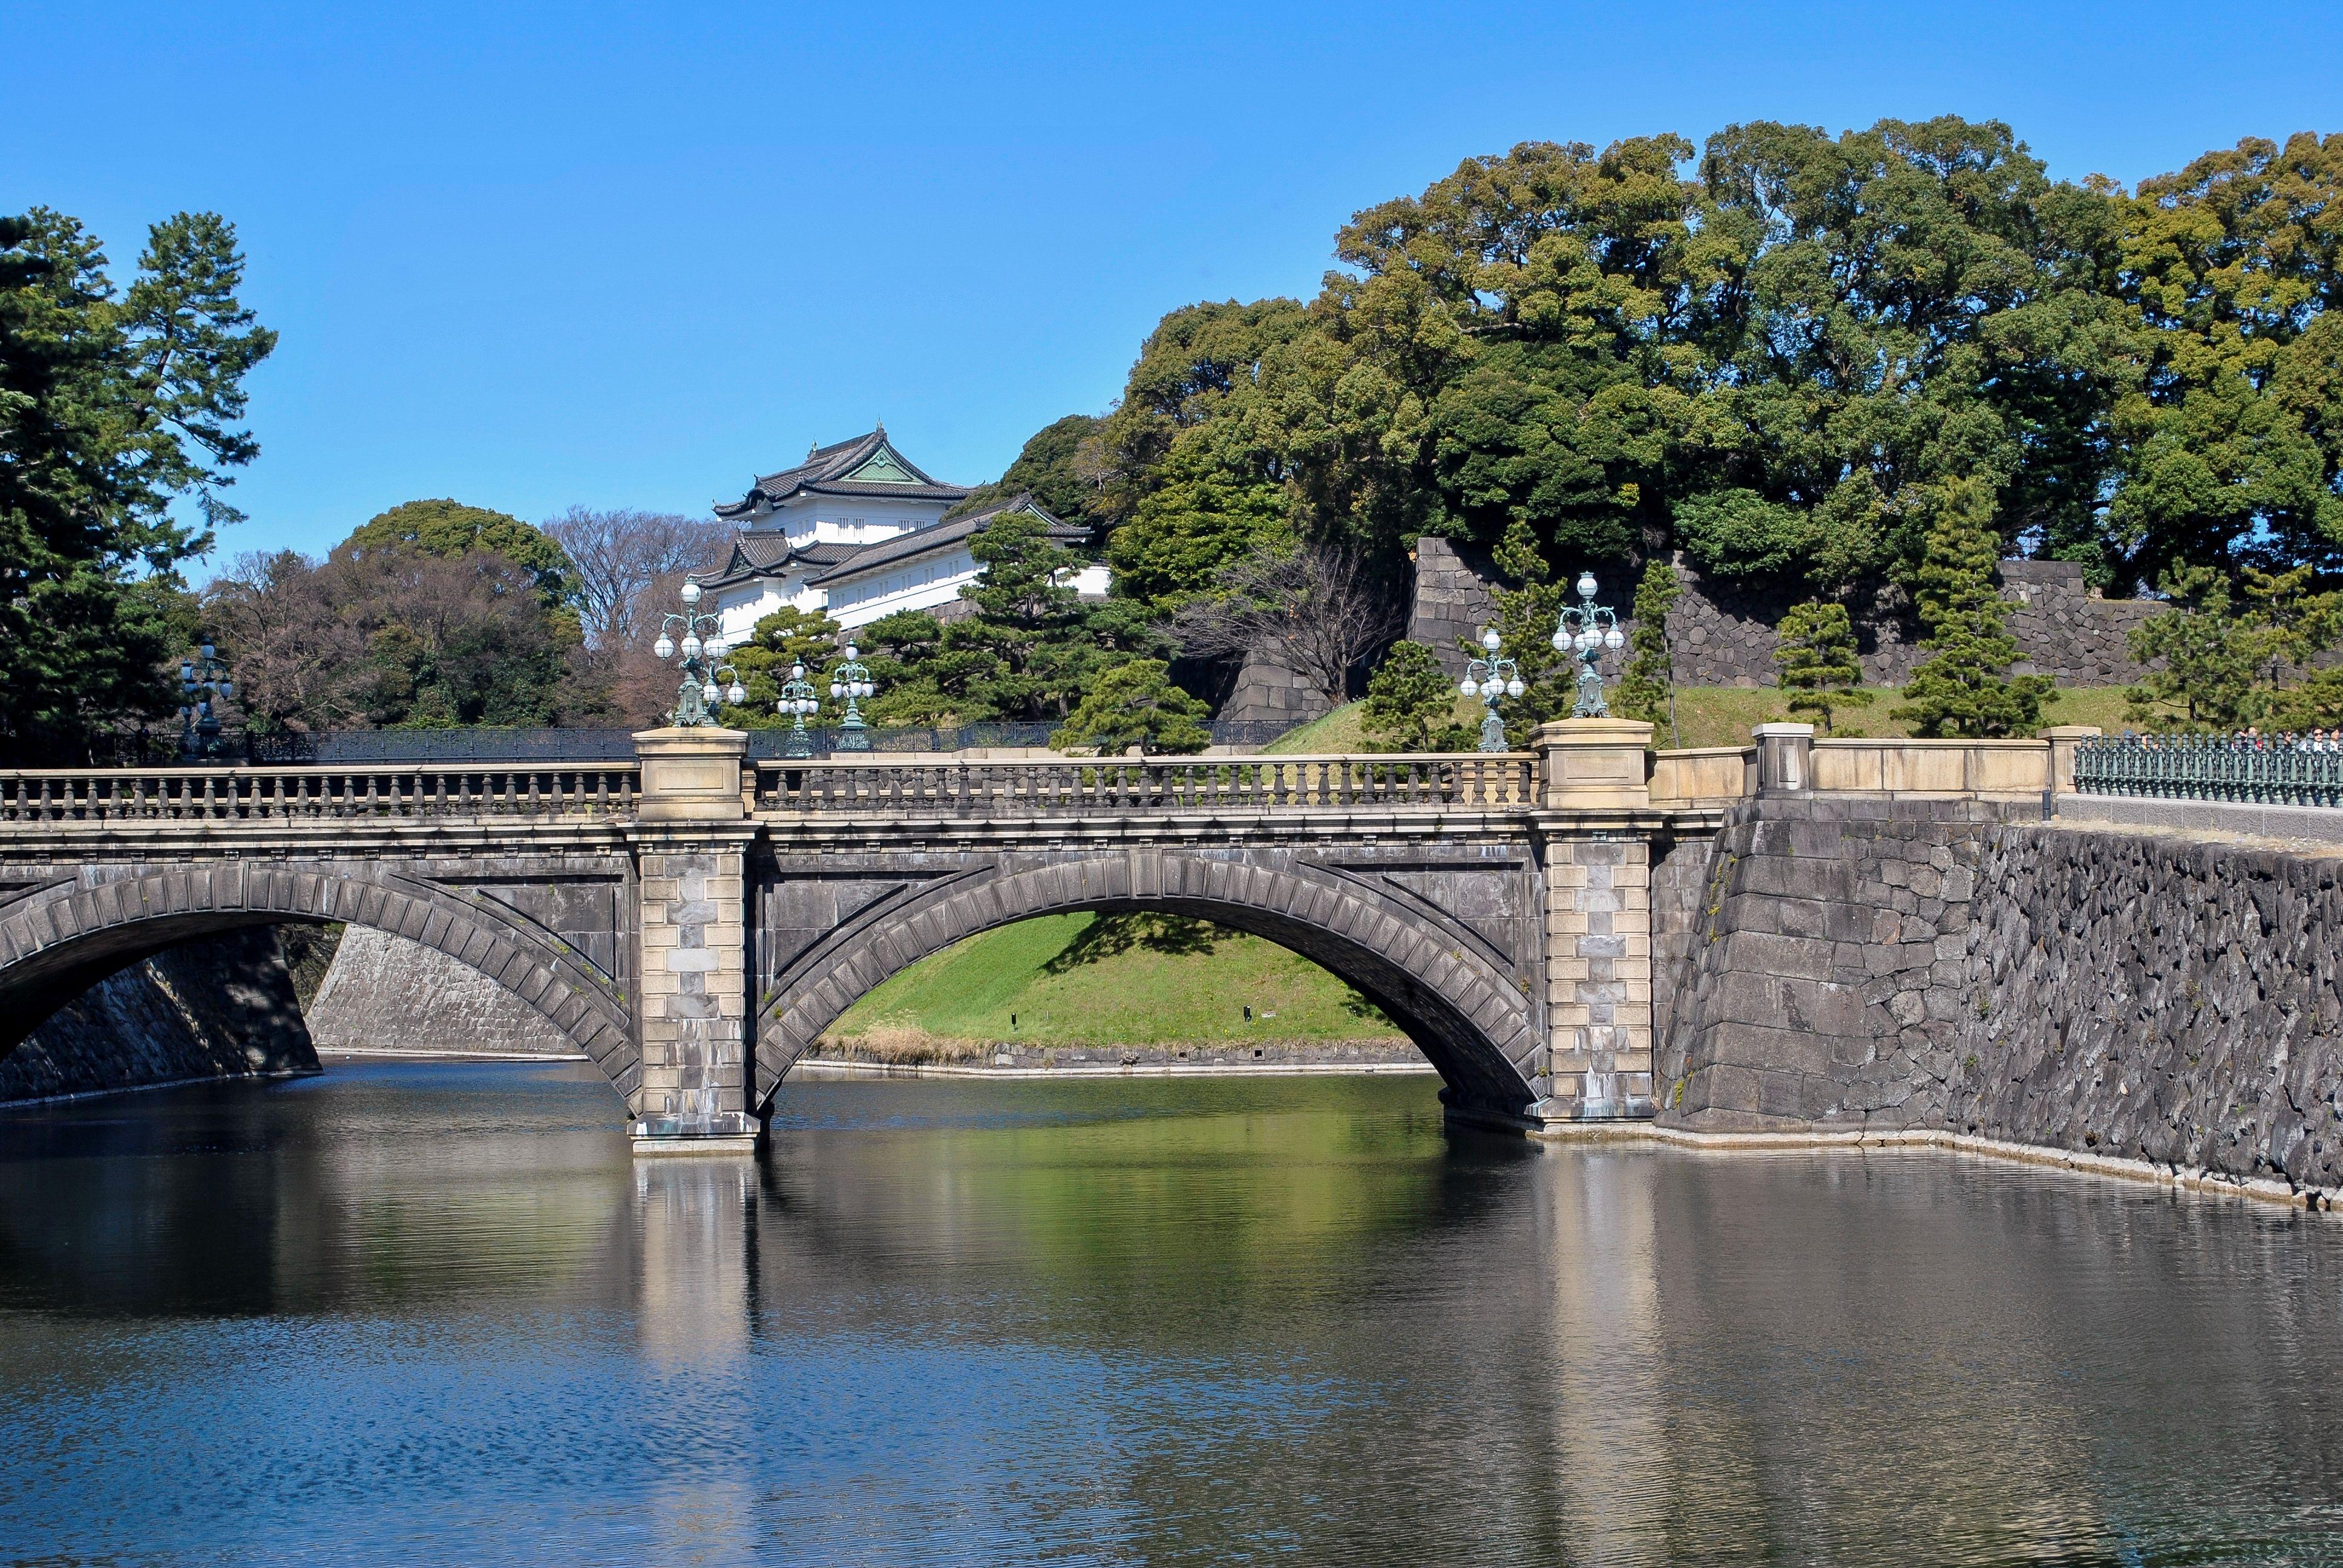 japanisches Kaiserhaus